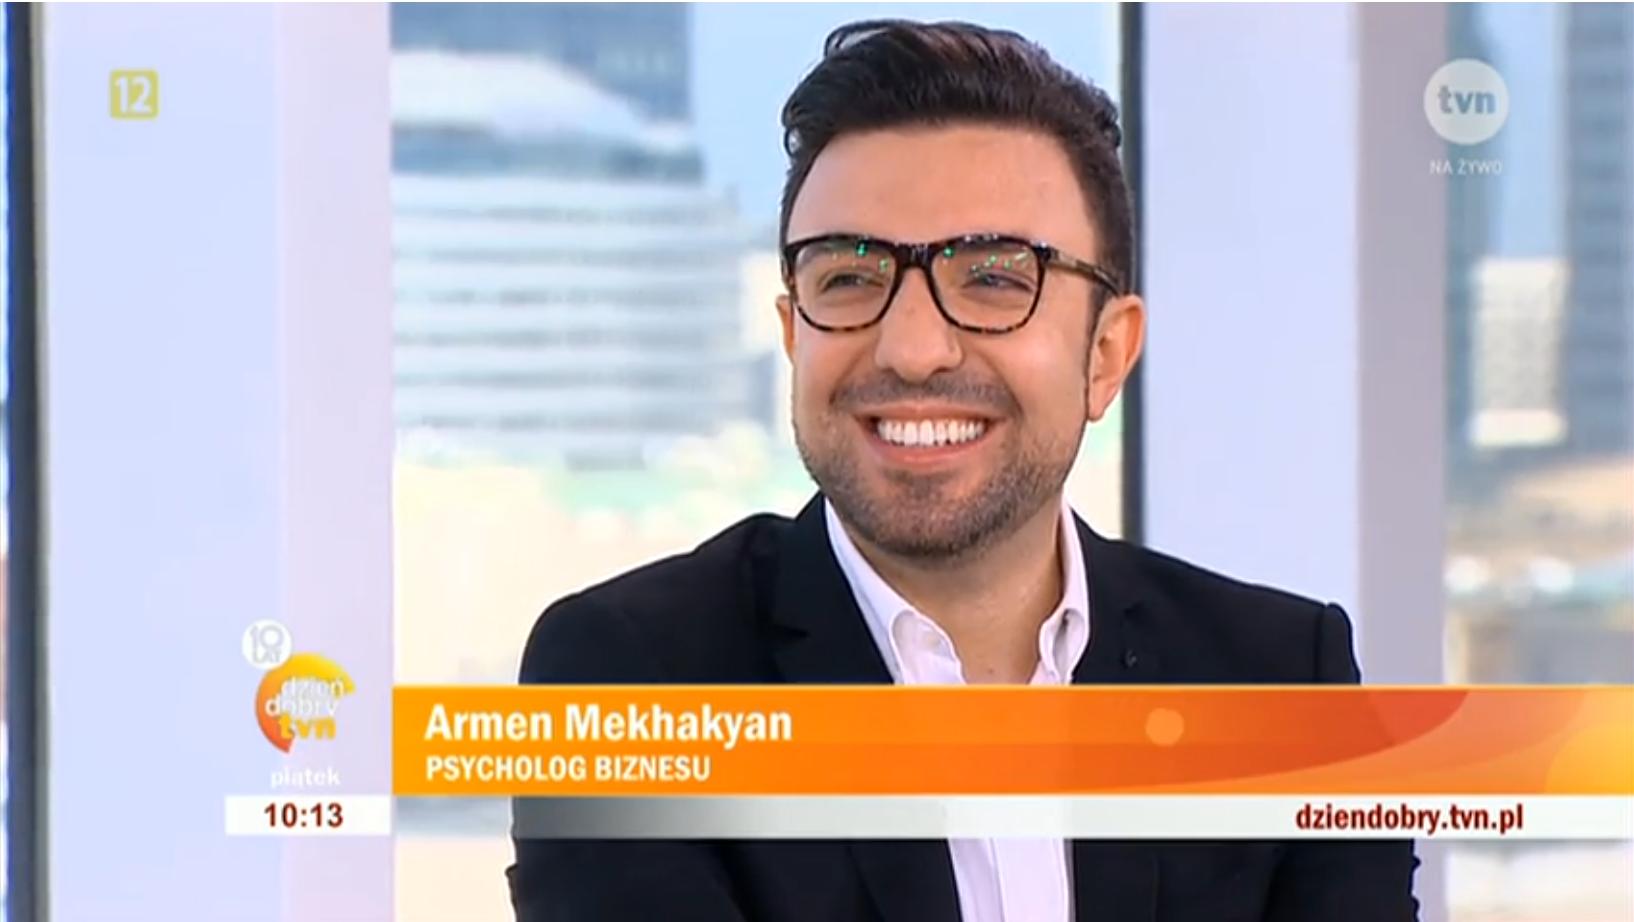 Dzień Dobry TVN, screenshot, Armen Mekhakyan psycholog biznesu